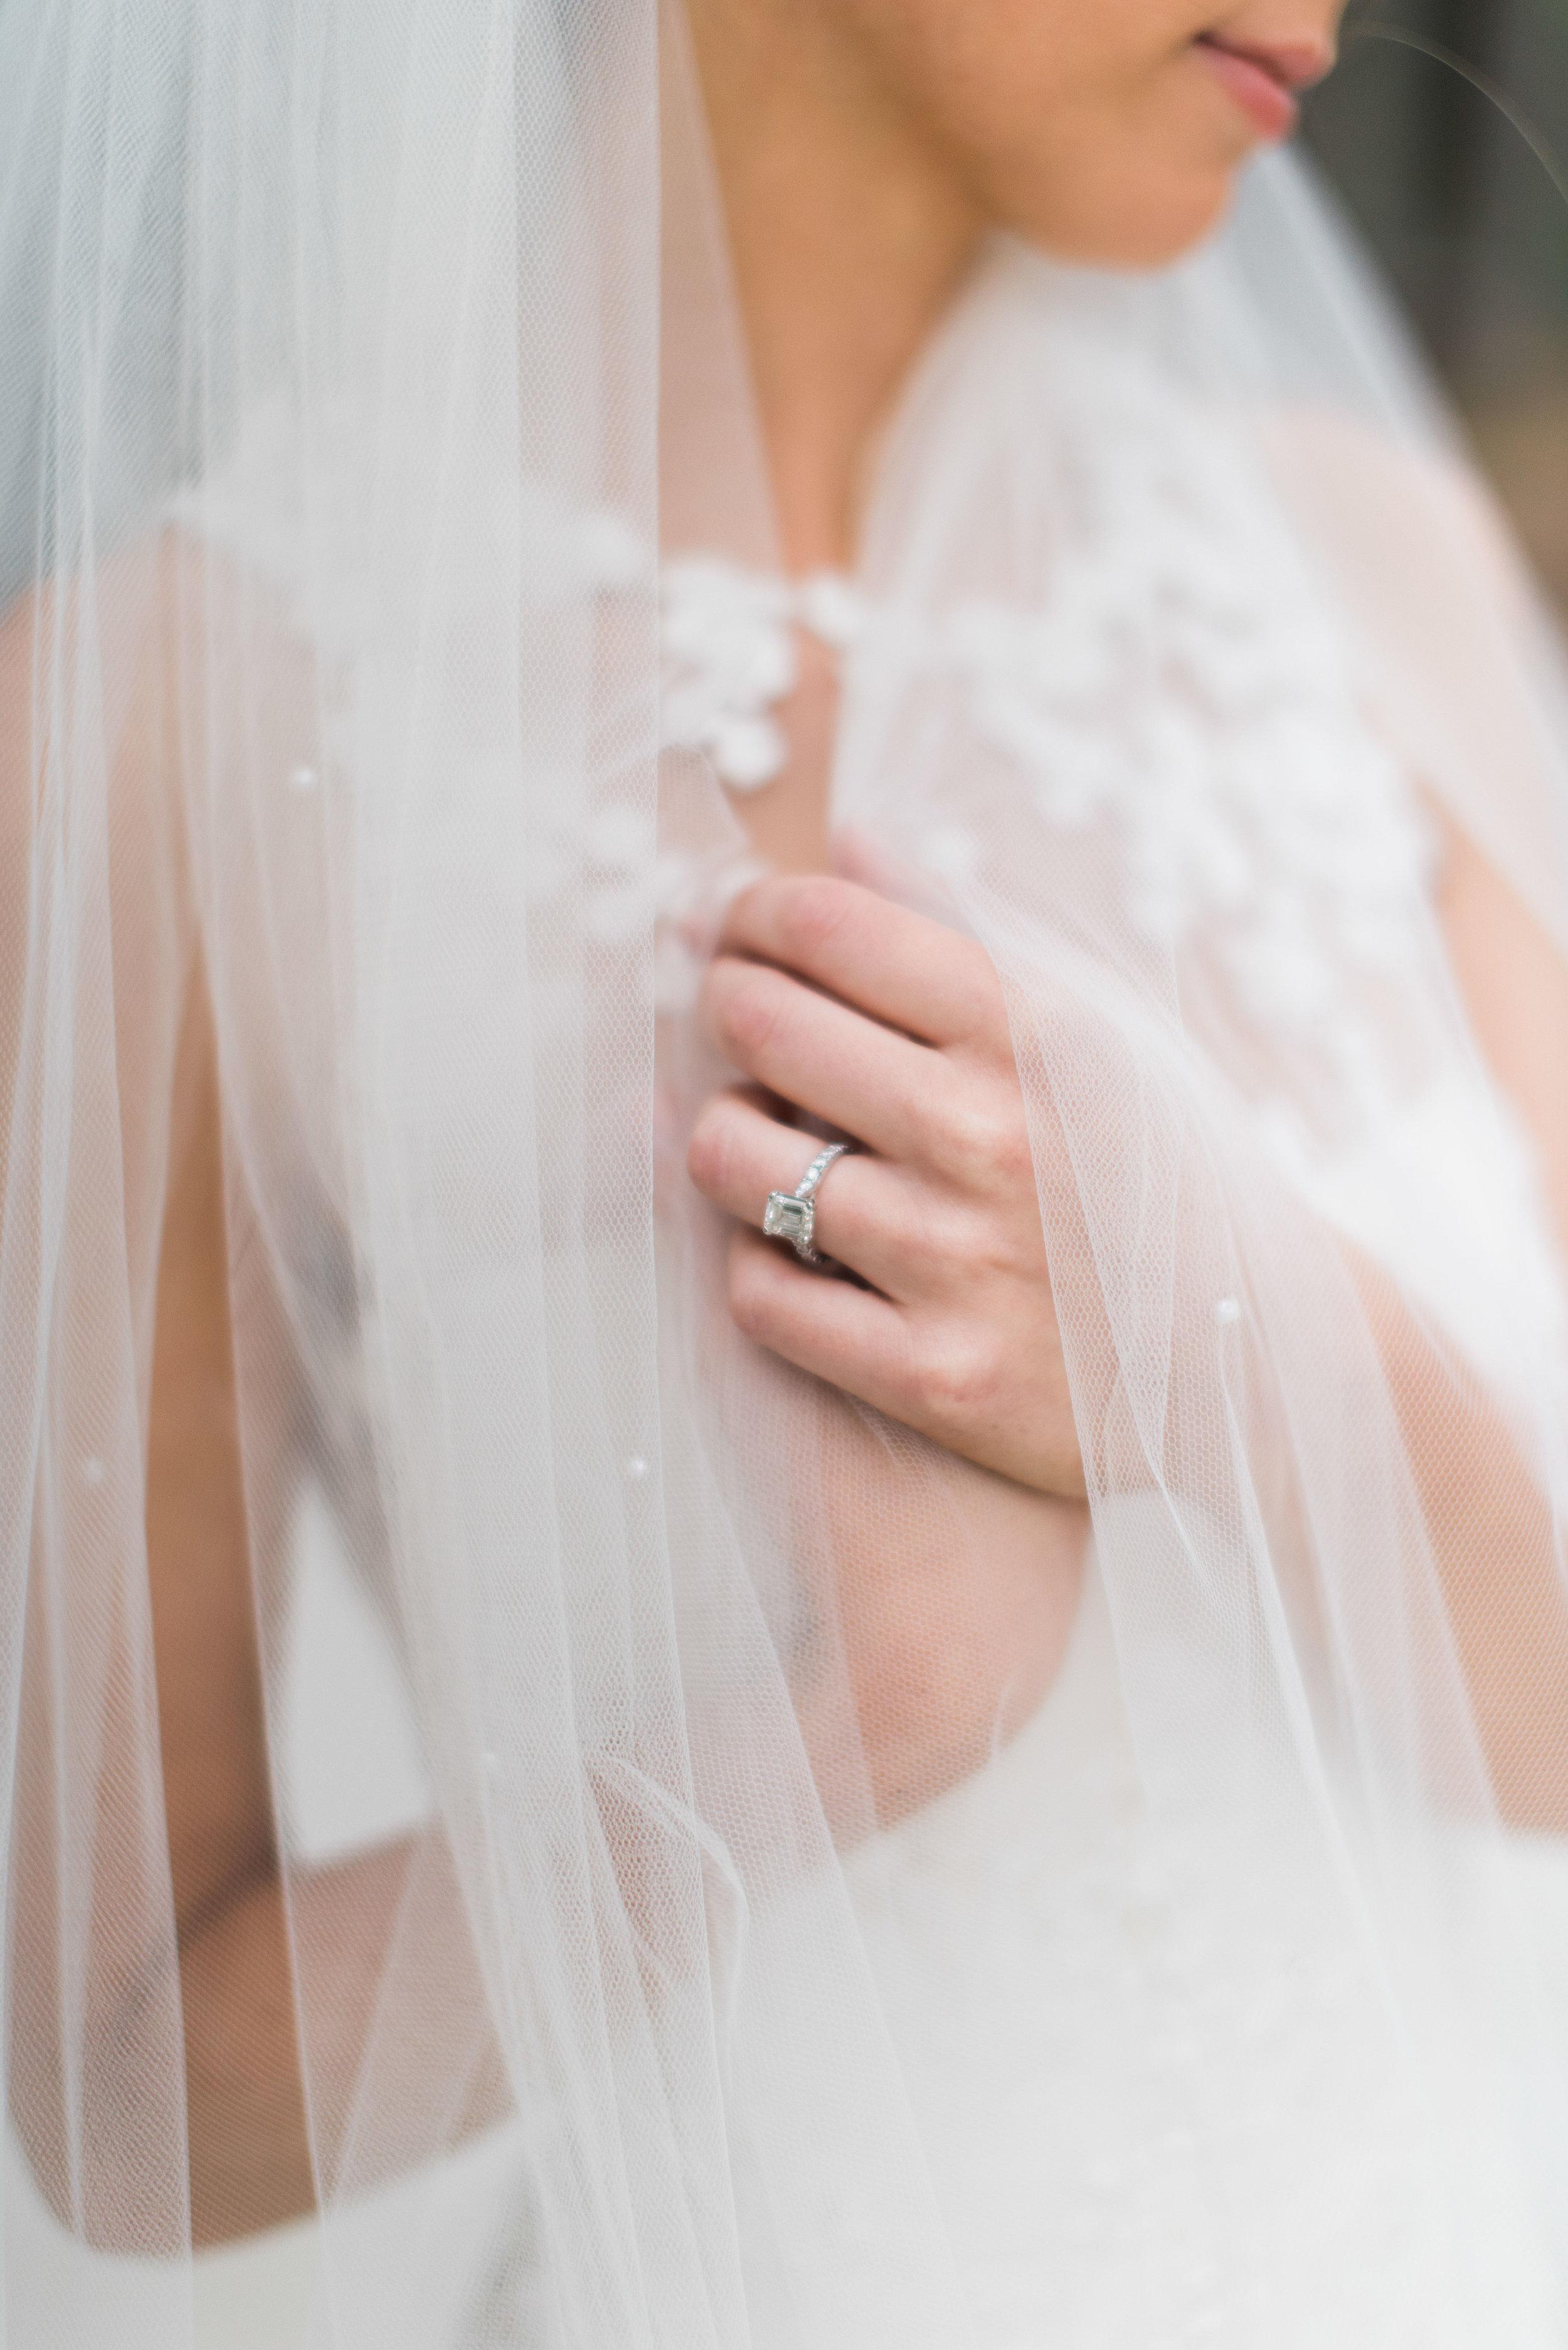 The-Dunlavy-Wedding-Photography-Bridals-Houston-Film-Dana-Fernandez-Photography-Potraits-9.jpg